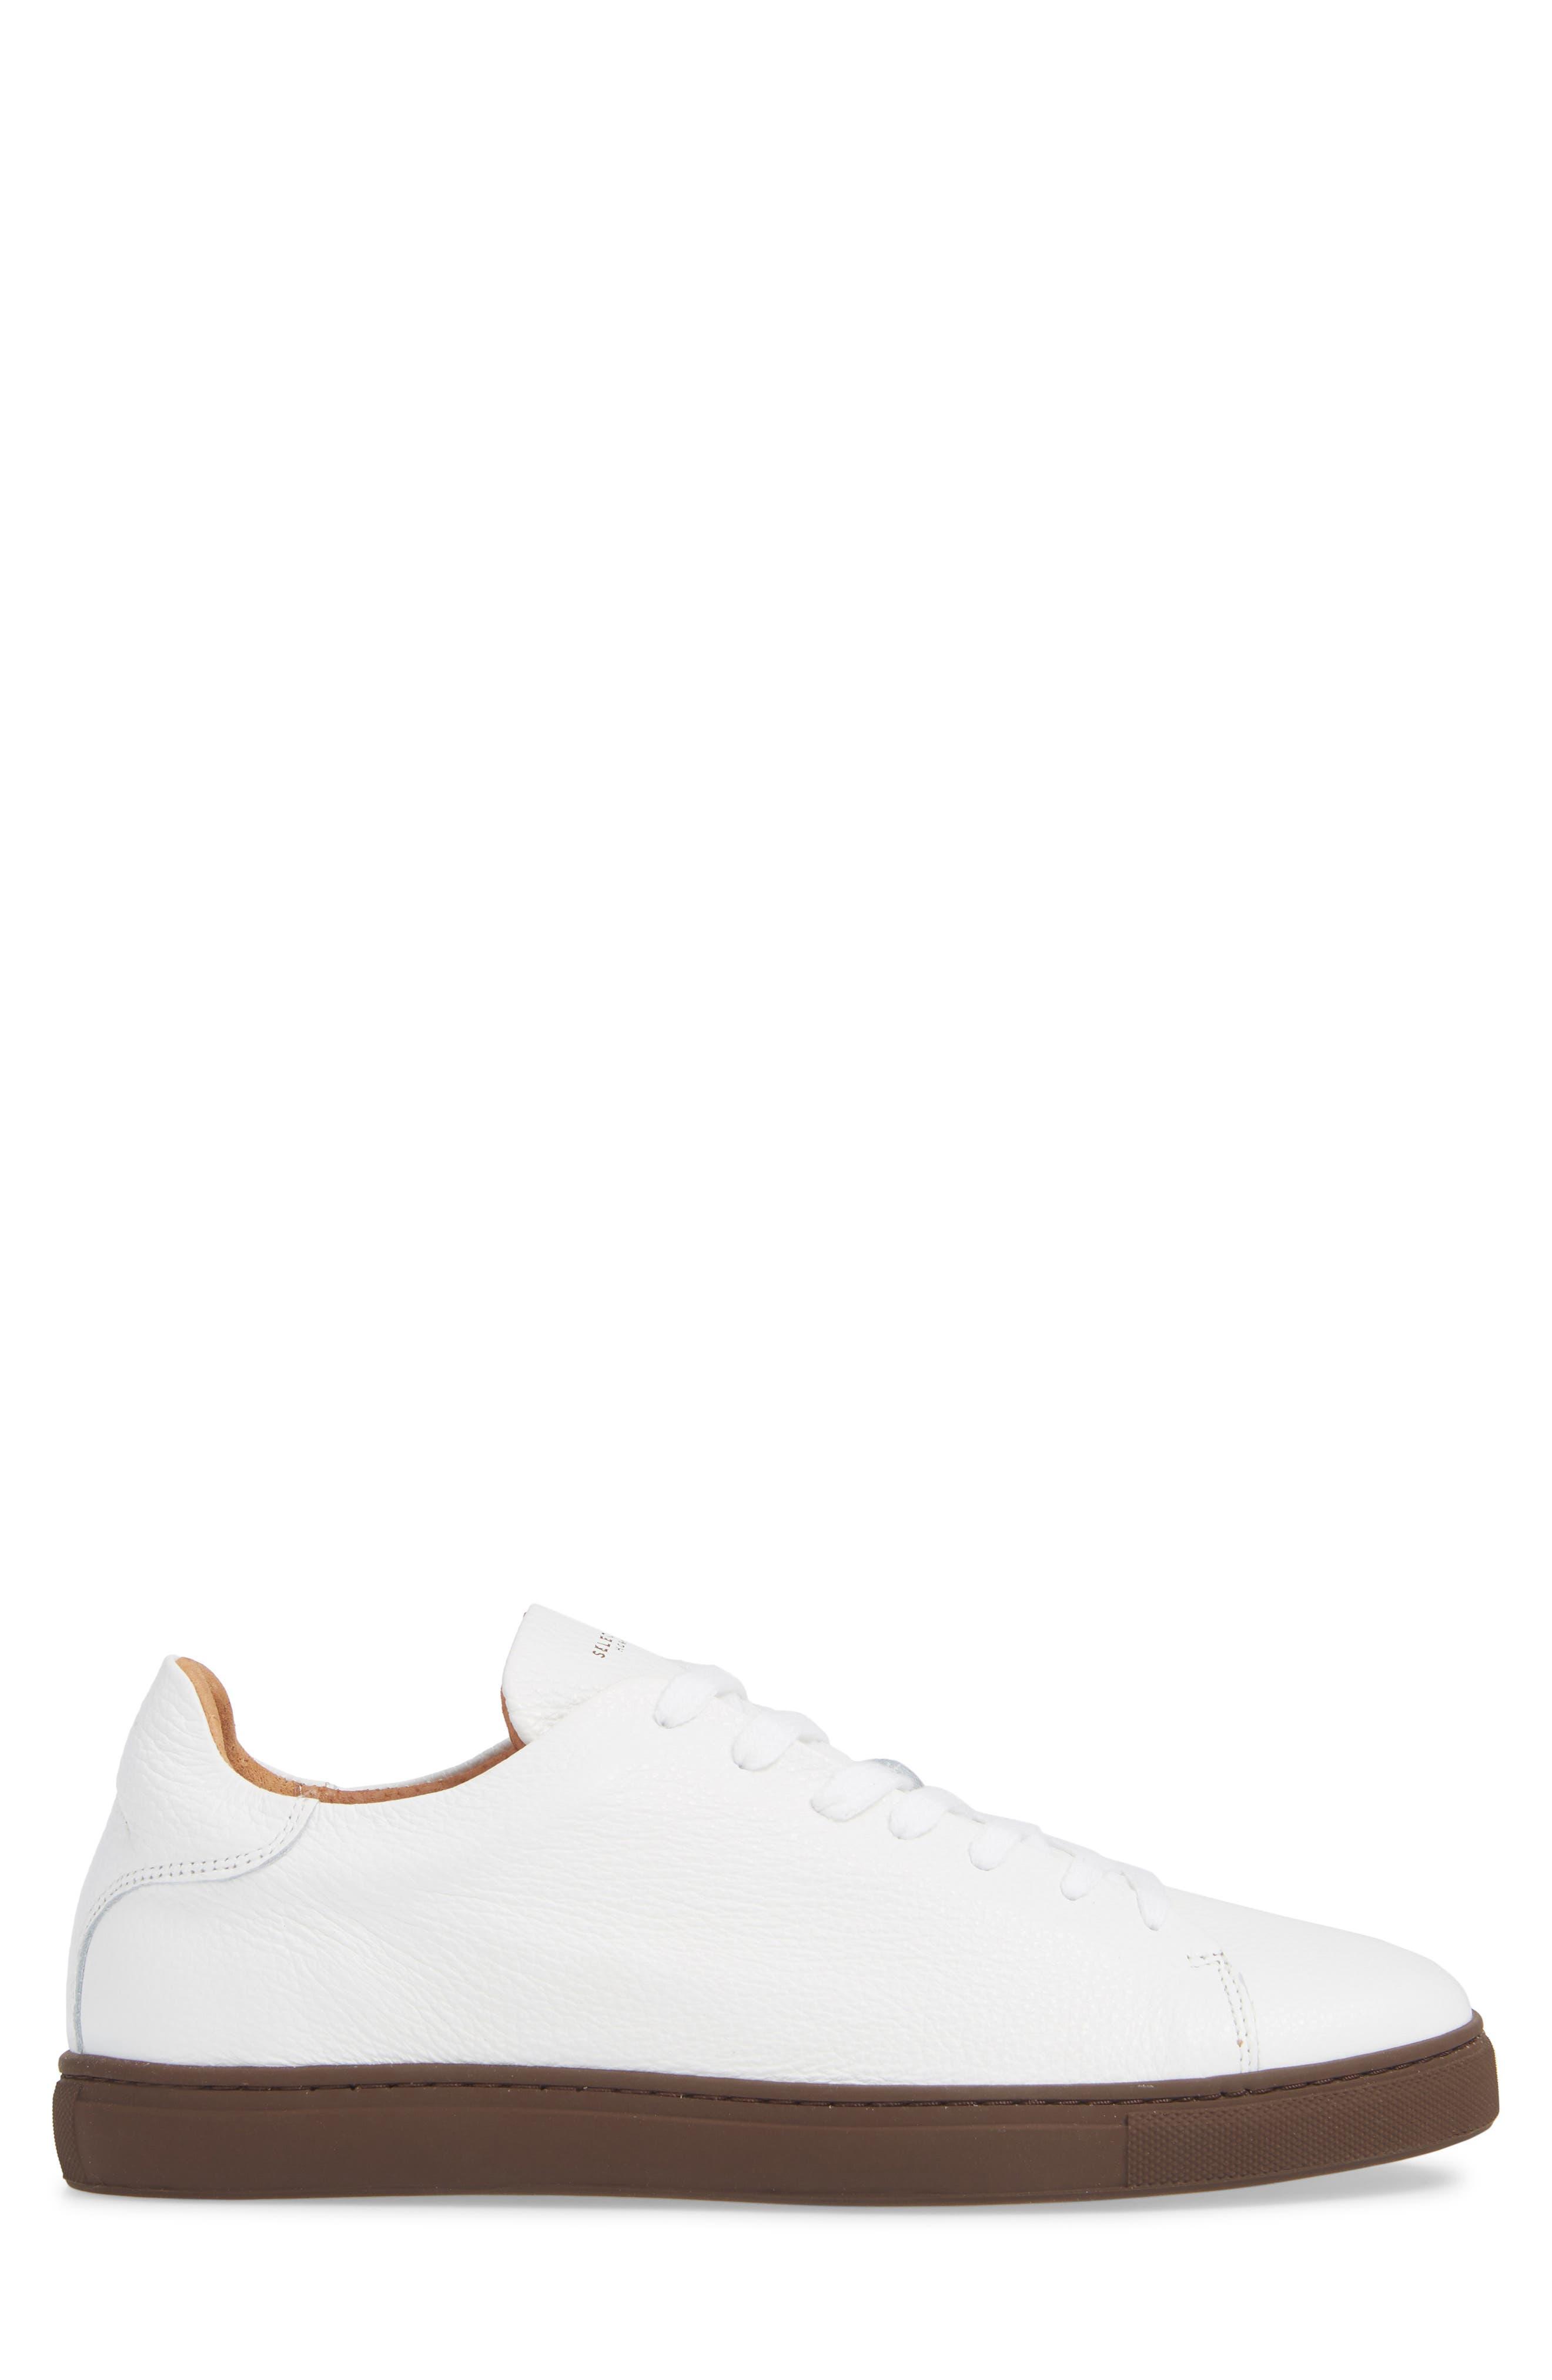 David Sneaker,                             Alternate thumbnail 3, color,                             WHITE/ BURGUNDY SOLE